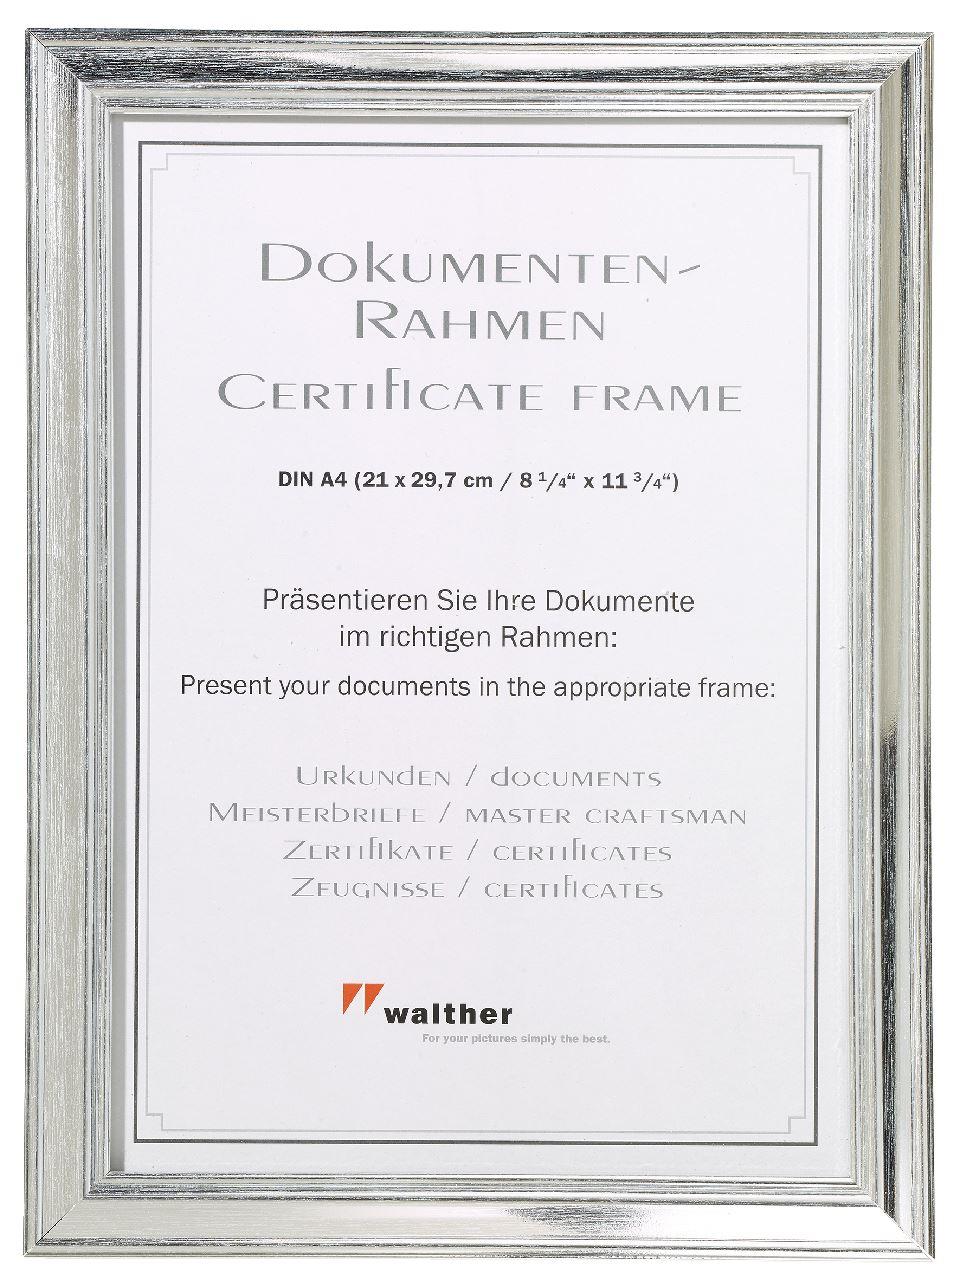 Walther Lounge Design Dokumentenrahmen | Multimedia | Bürotechnik ...